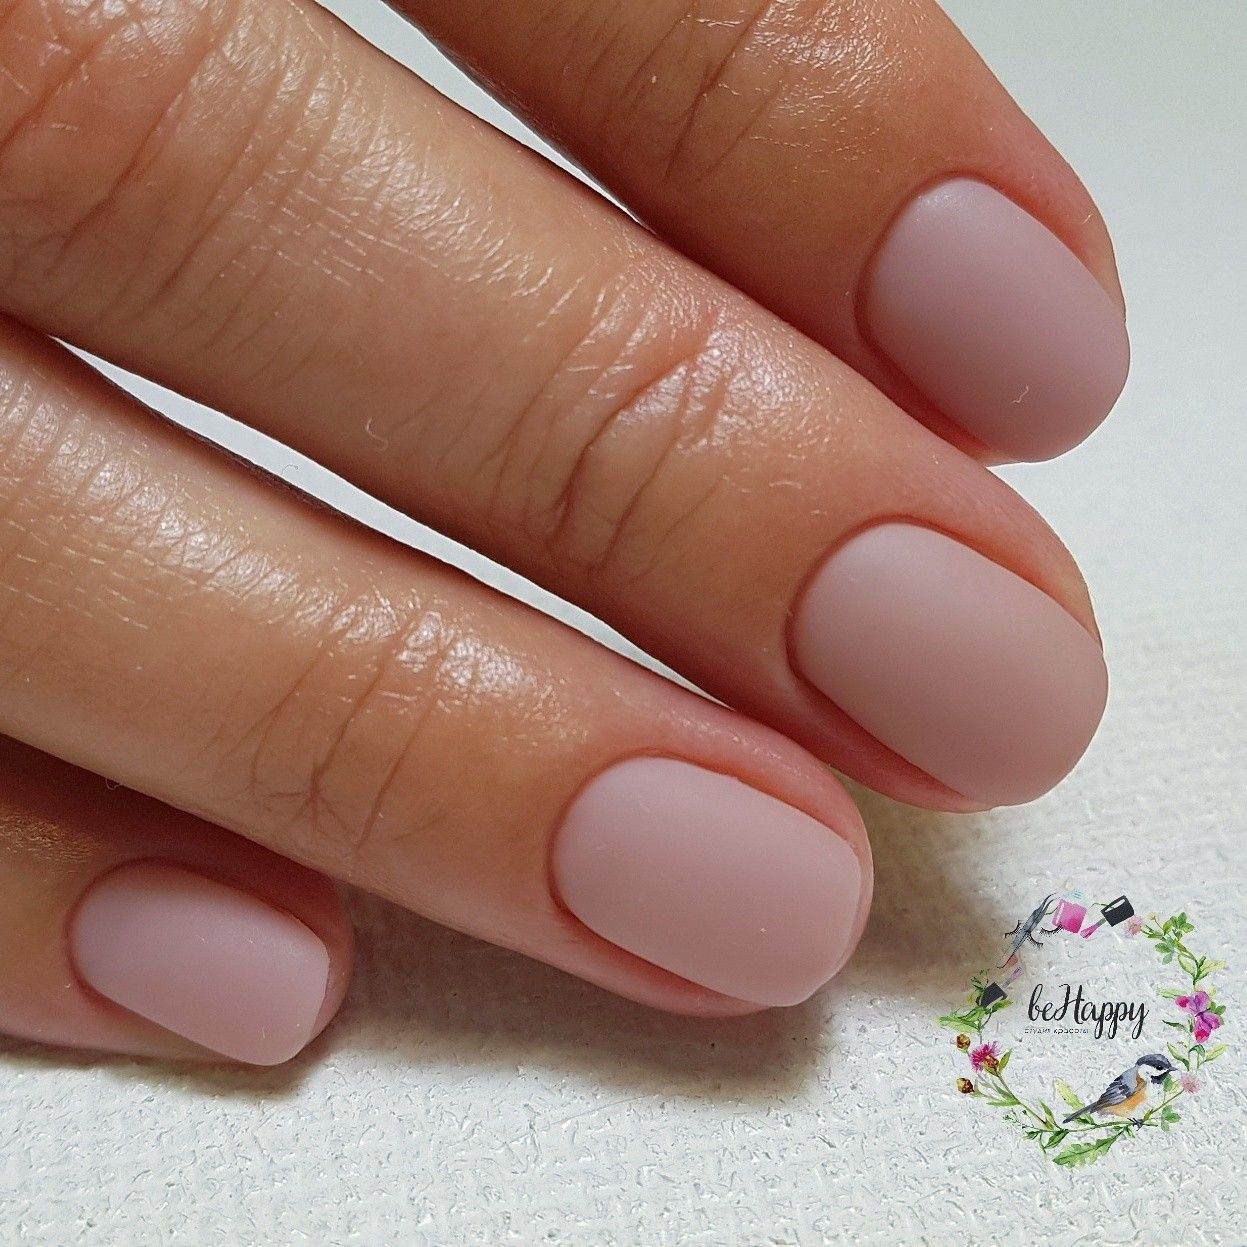 Pin By Lucie Havlaskova On Manicure Manikura Pekne Nehty